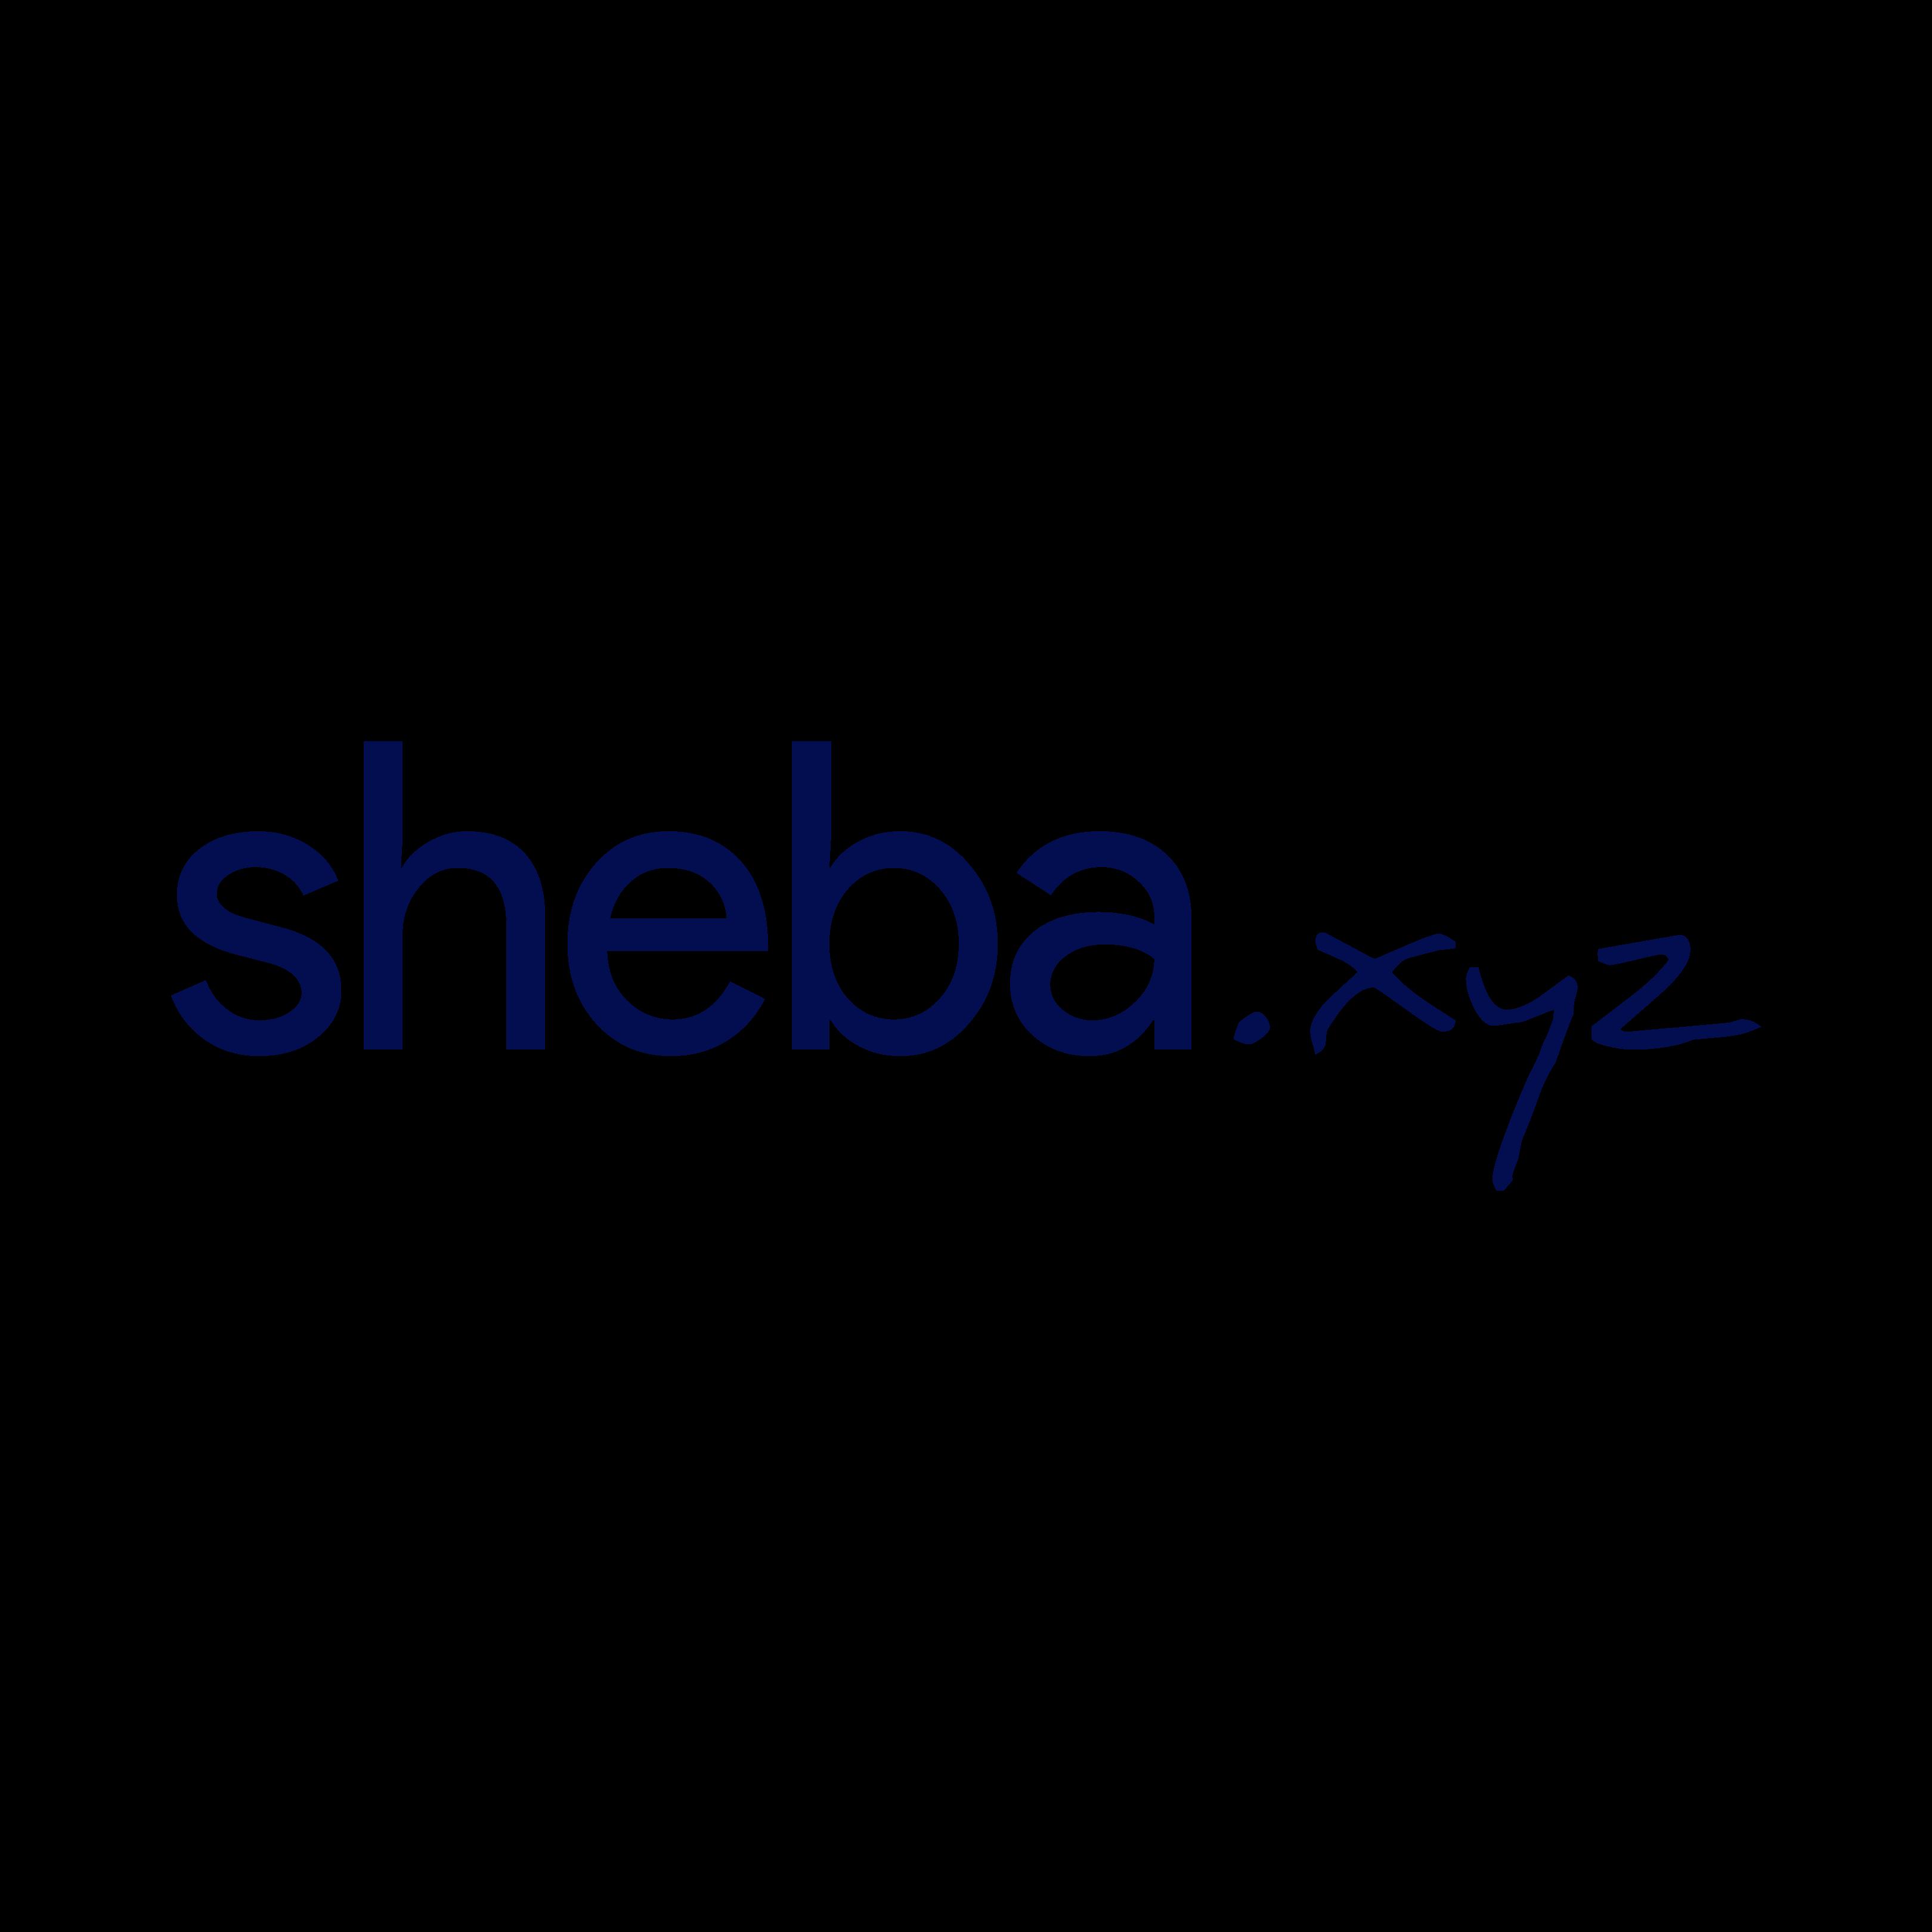 https://assets.roar.media/assets/ctp2G3uSZ6oUCHtD_Sheba-Logo.png